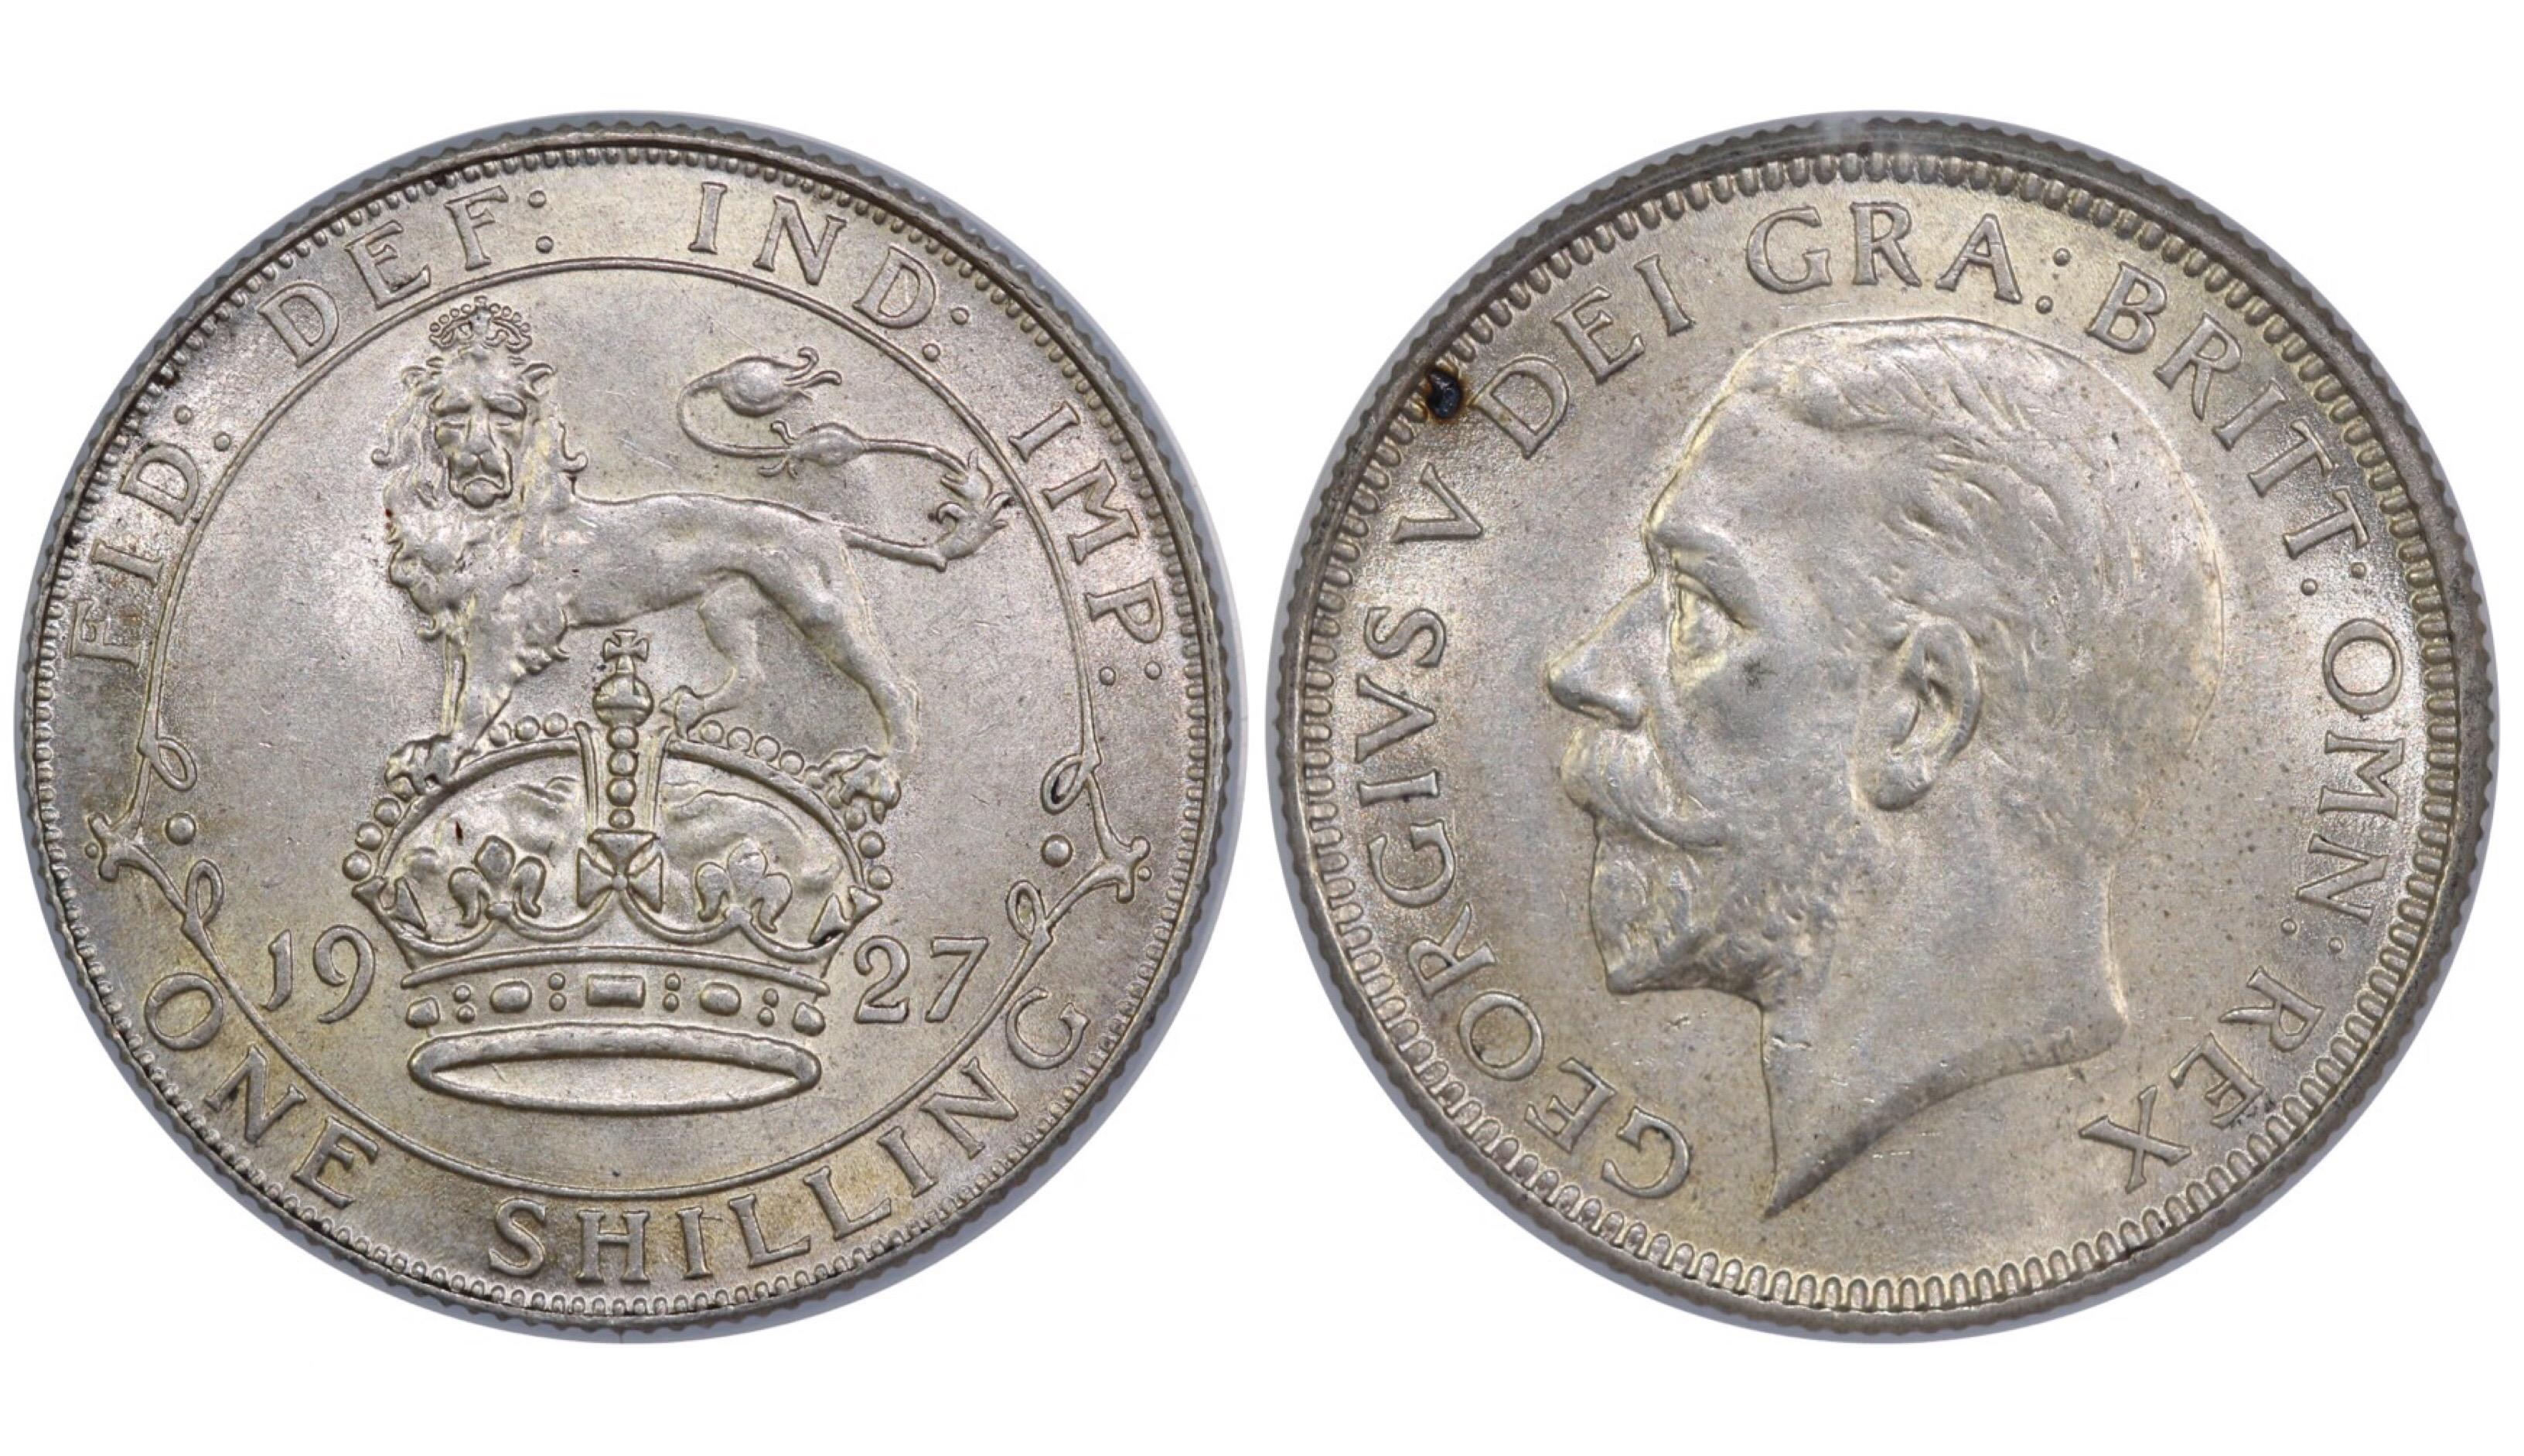 1927 Shilling, CGS 75, George V, ME, ESC 1438, UIN 29054